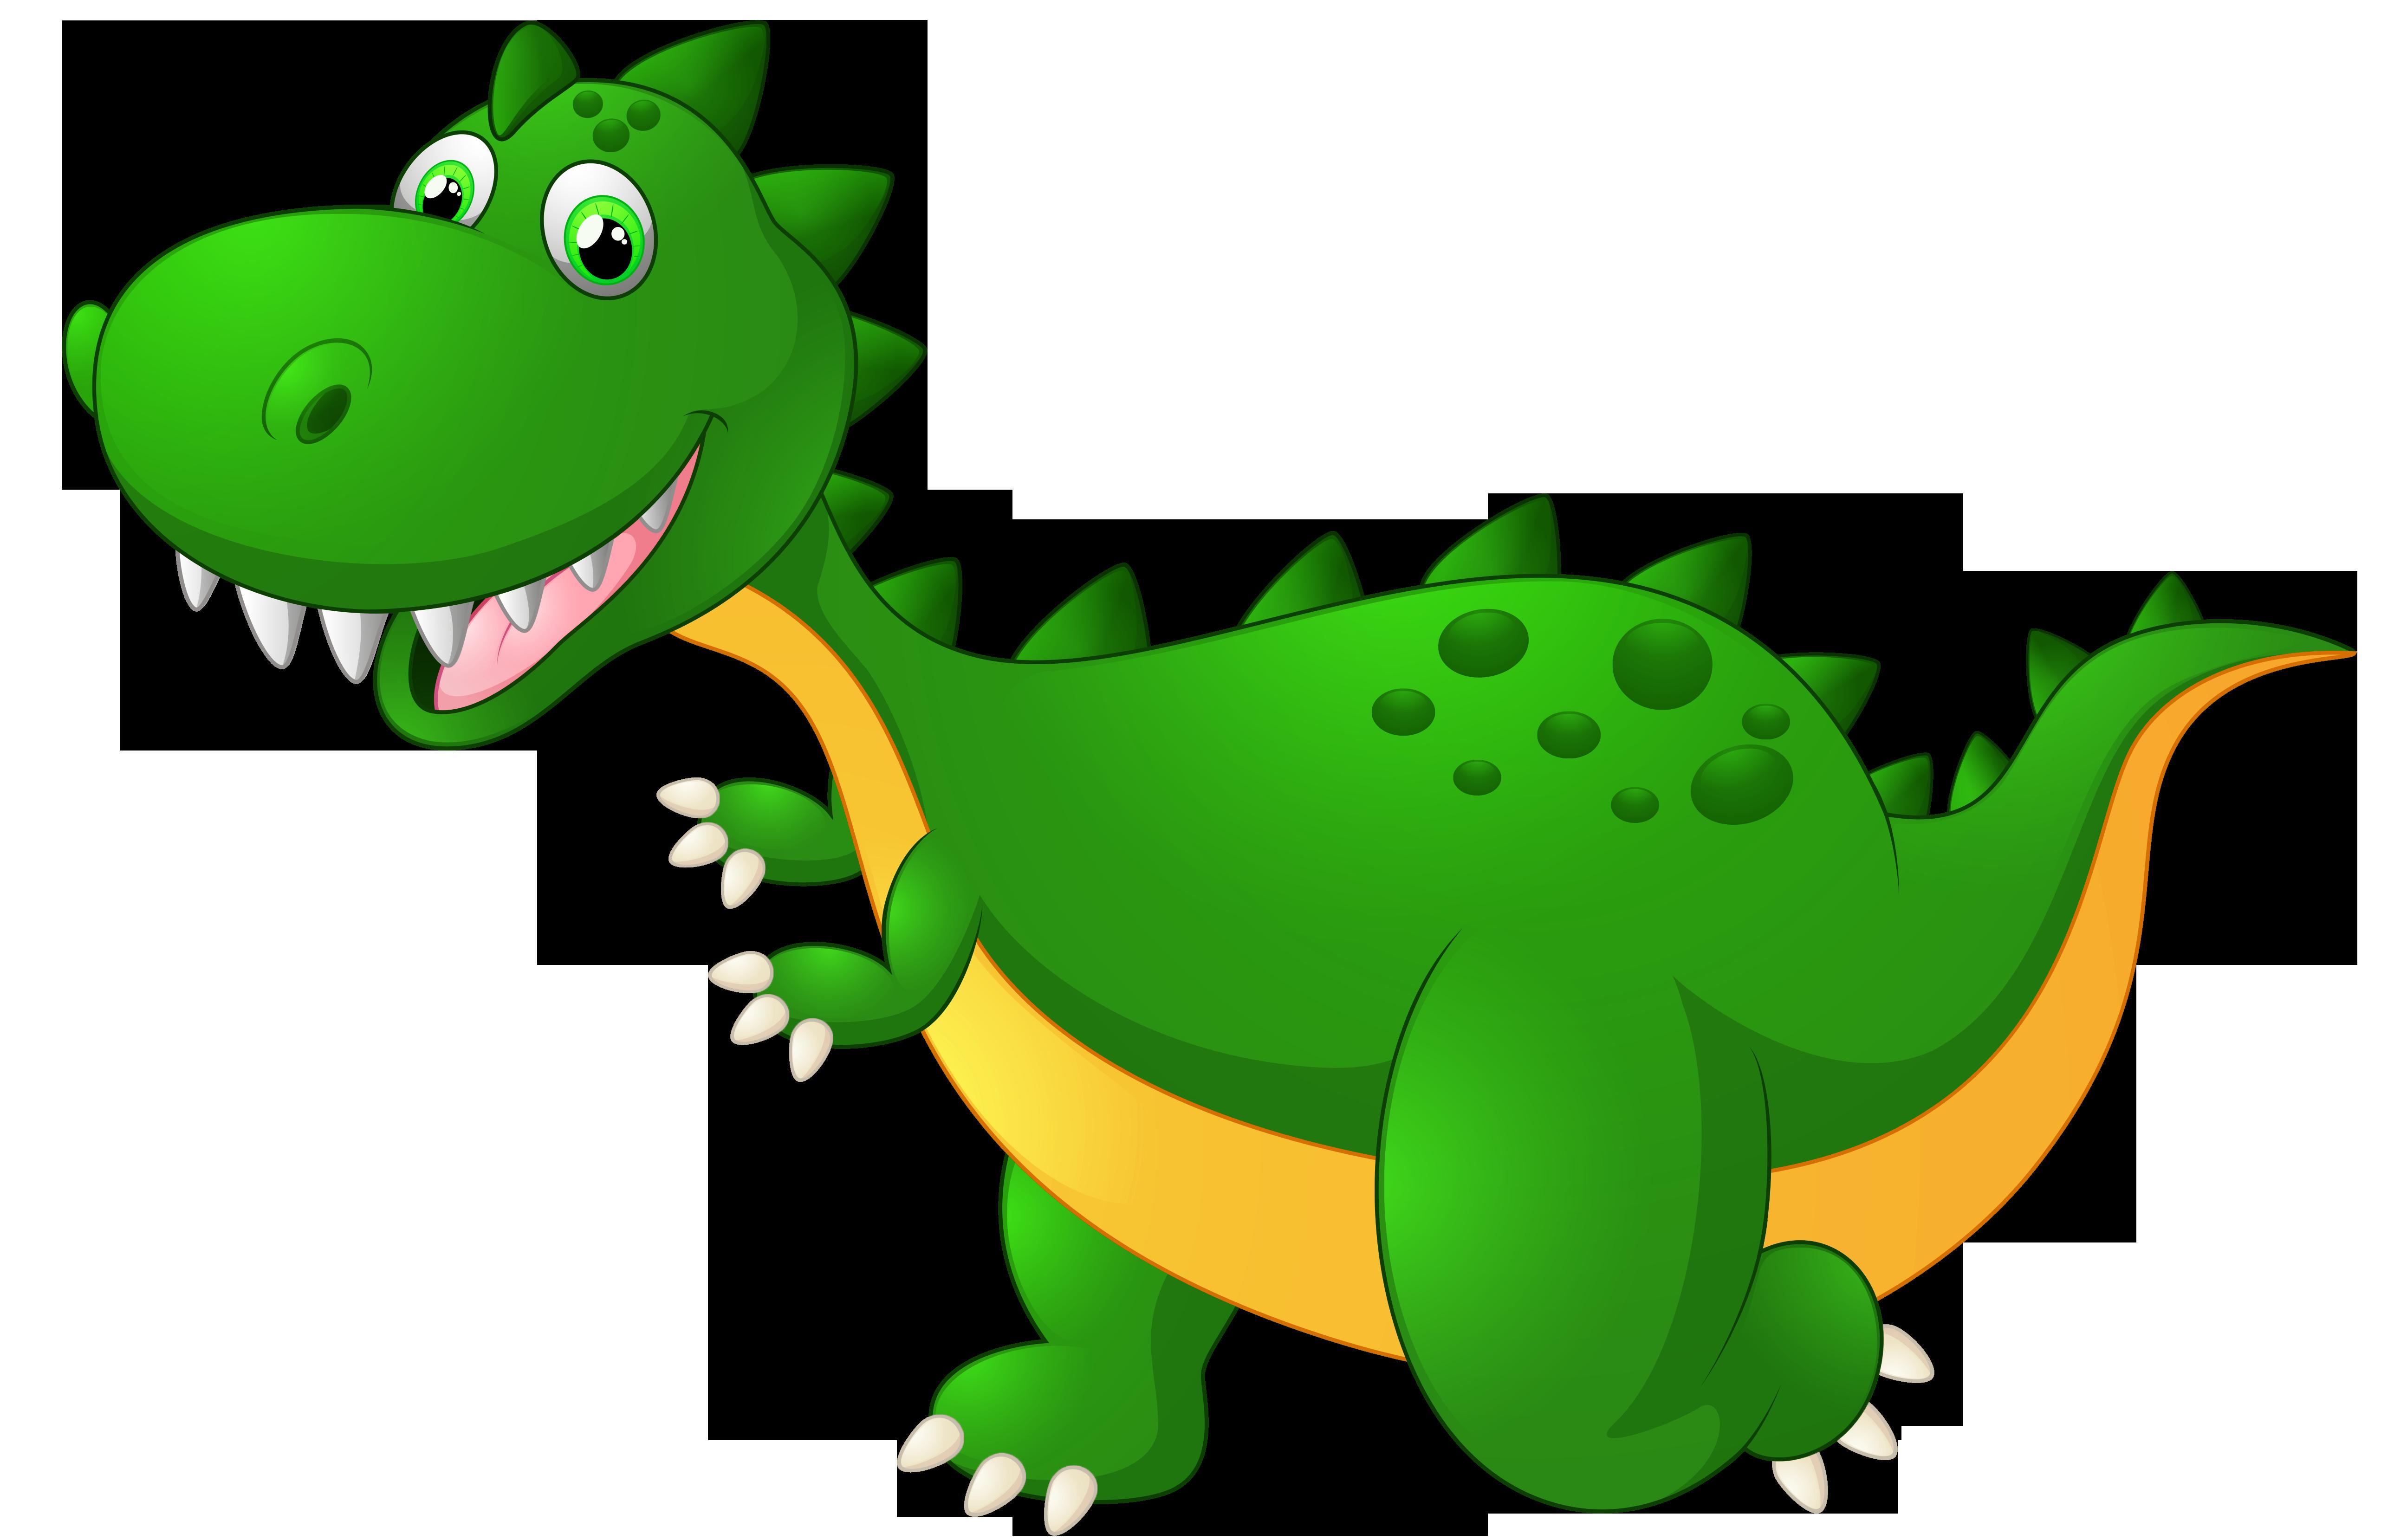 5157x3318 Cute Dragon Cartoon Png Clipart Imageu200b Gallery Yopriceville